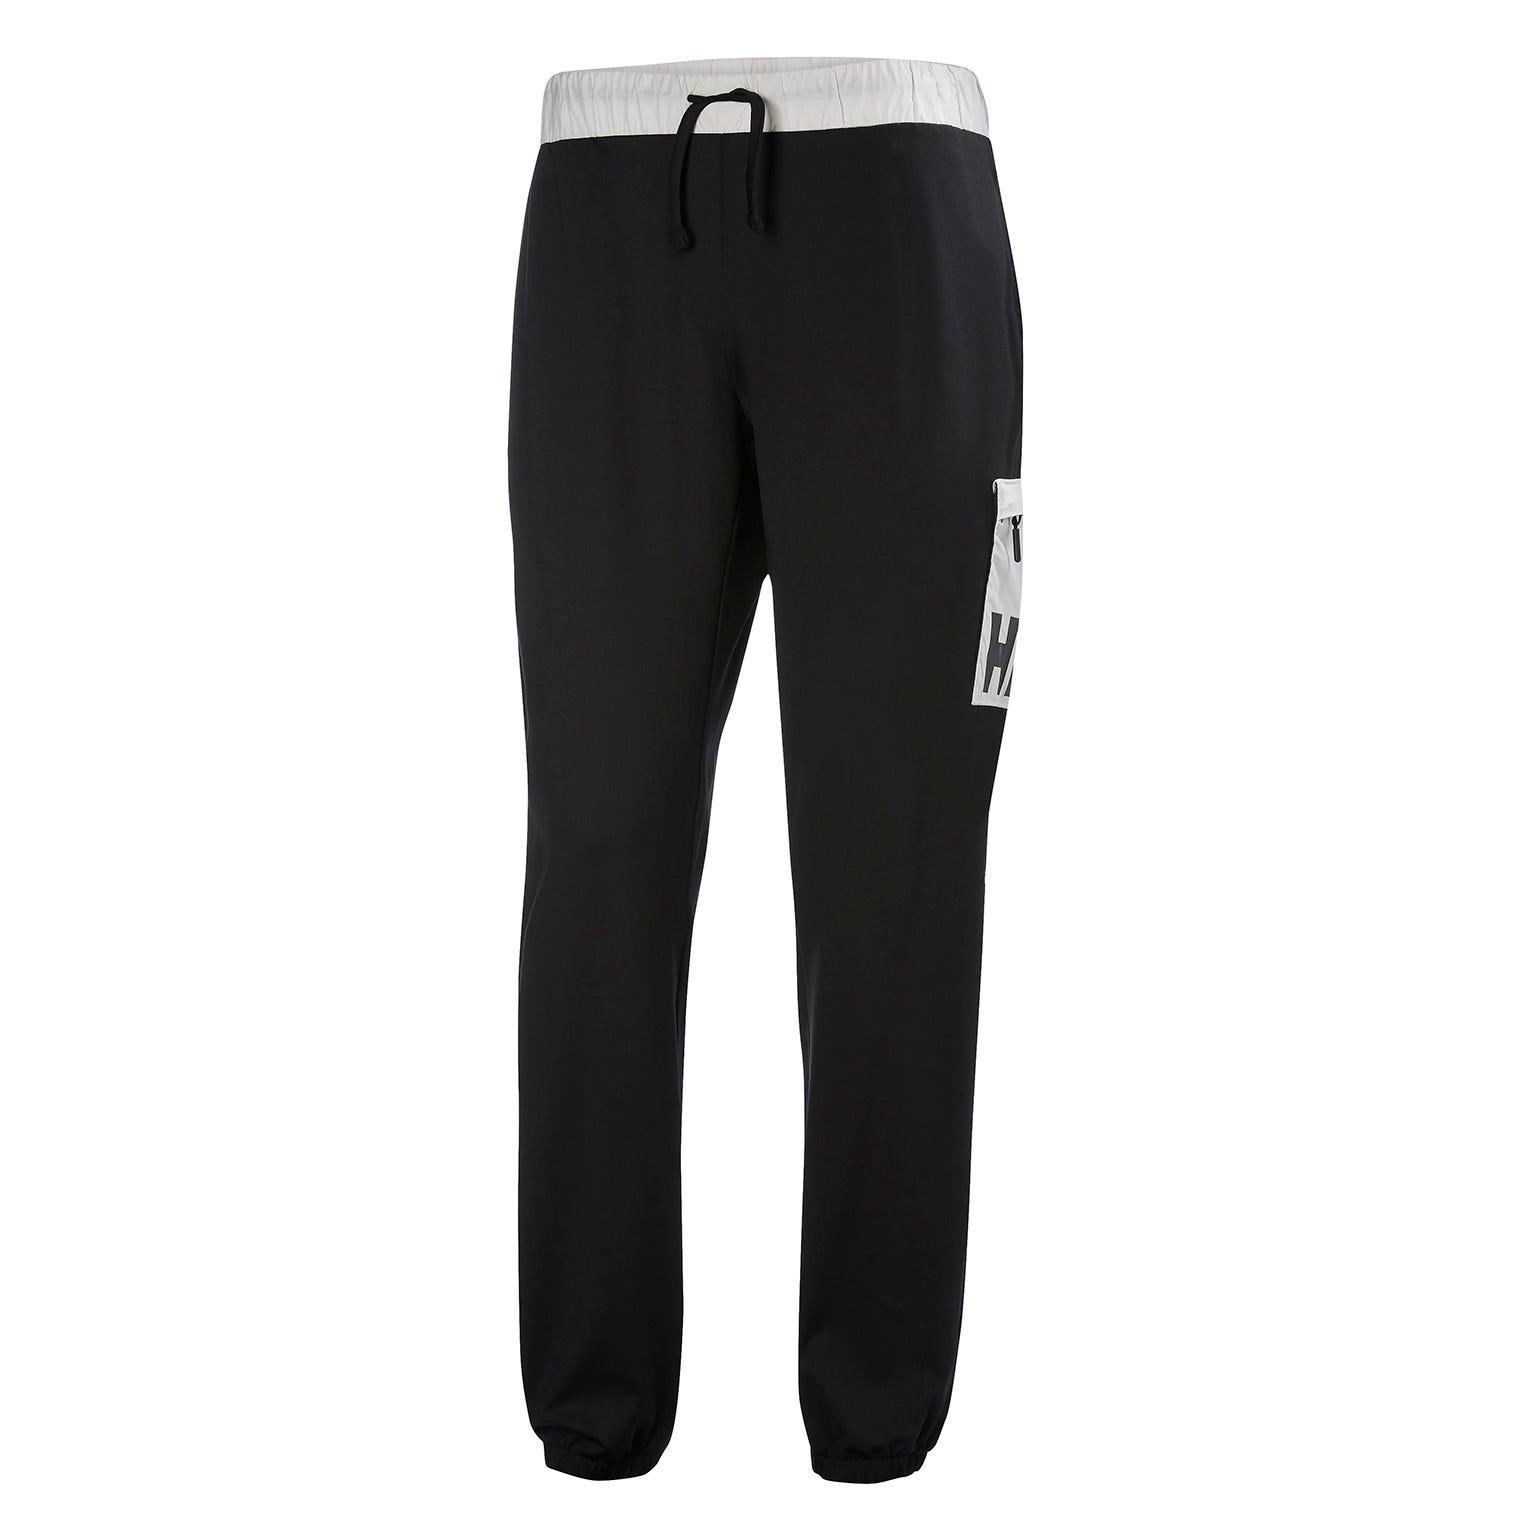 Helly Hansen Mens Pc Trousers Black XXL